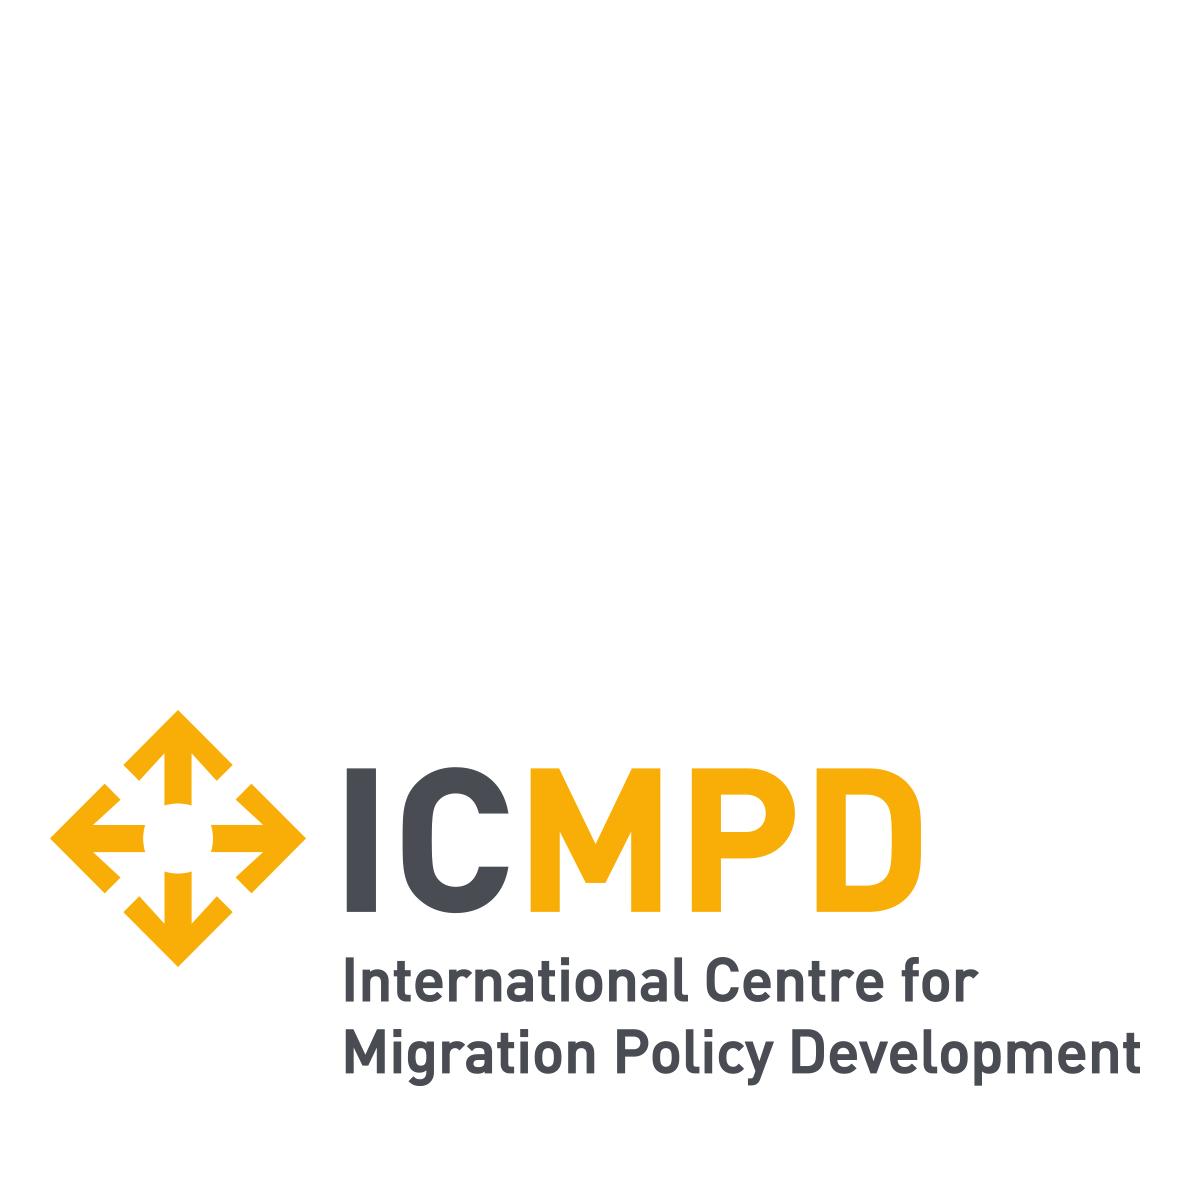 ICMPD-logo.png